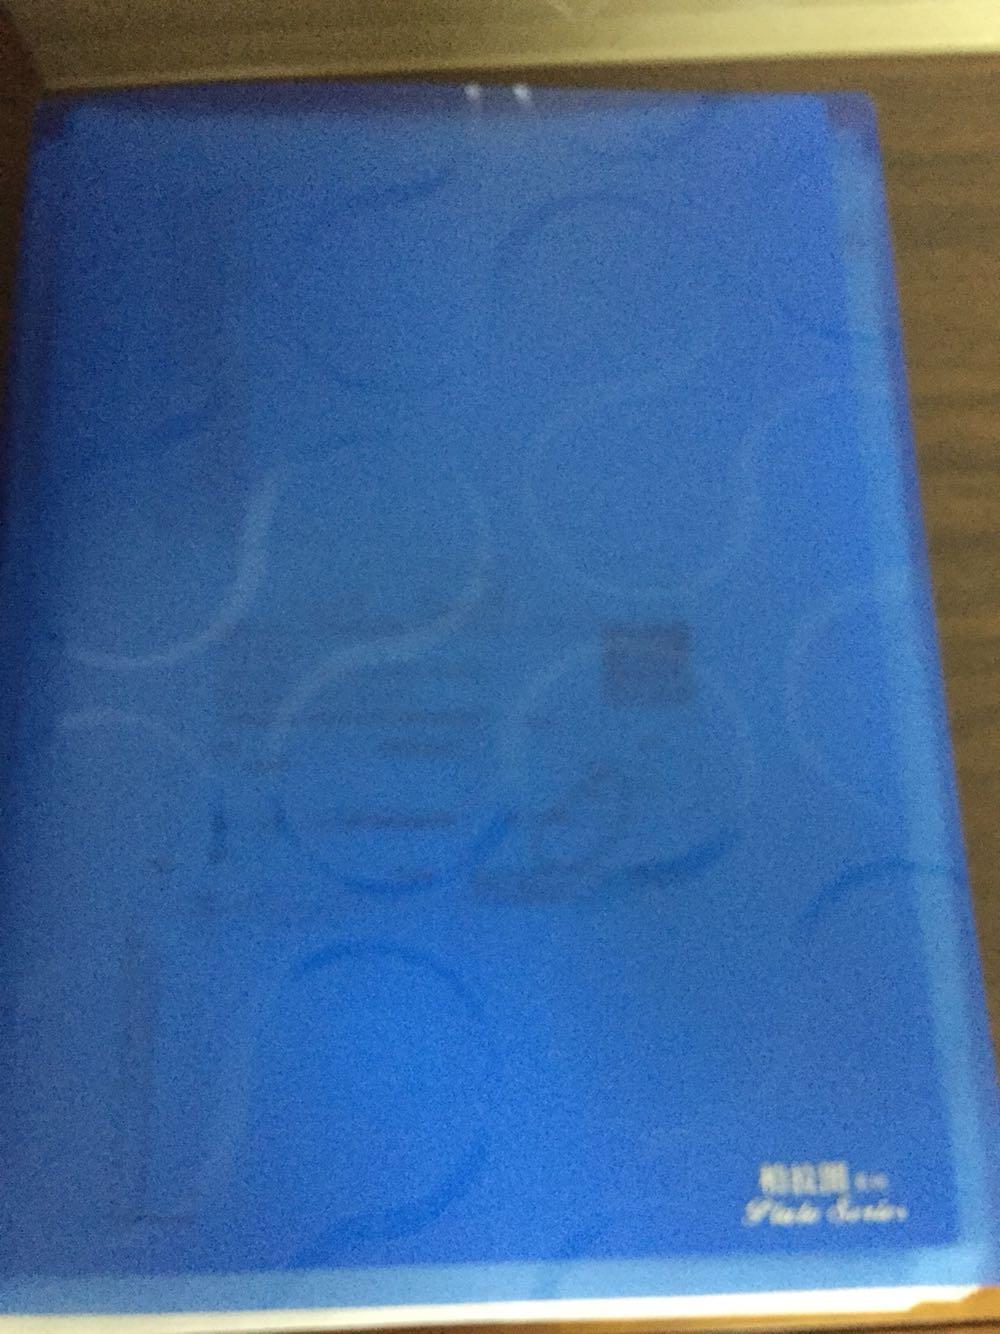 nike free run 3.0 v4 menstrual cycle 00217369 store